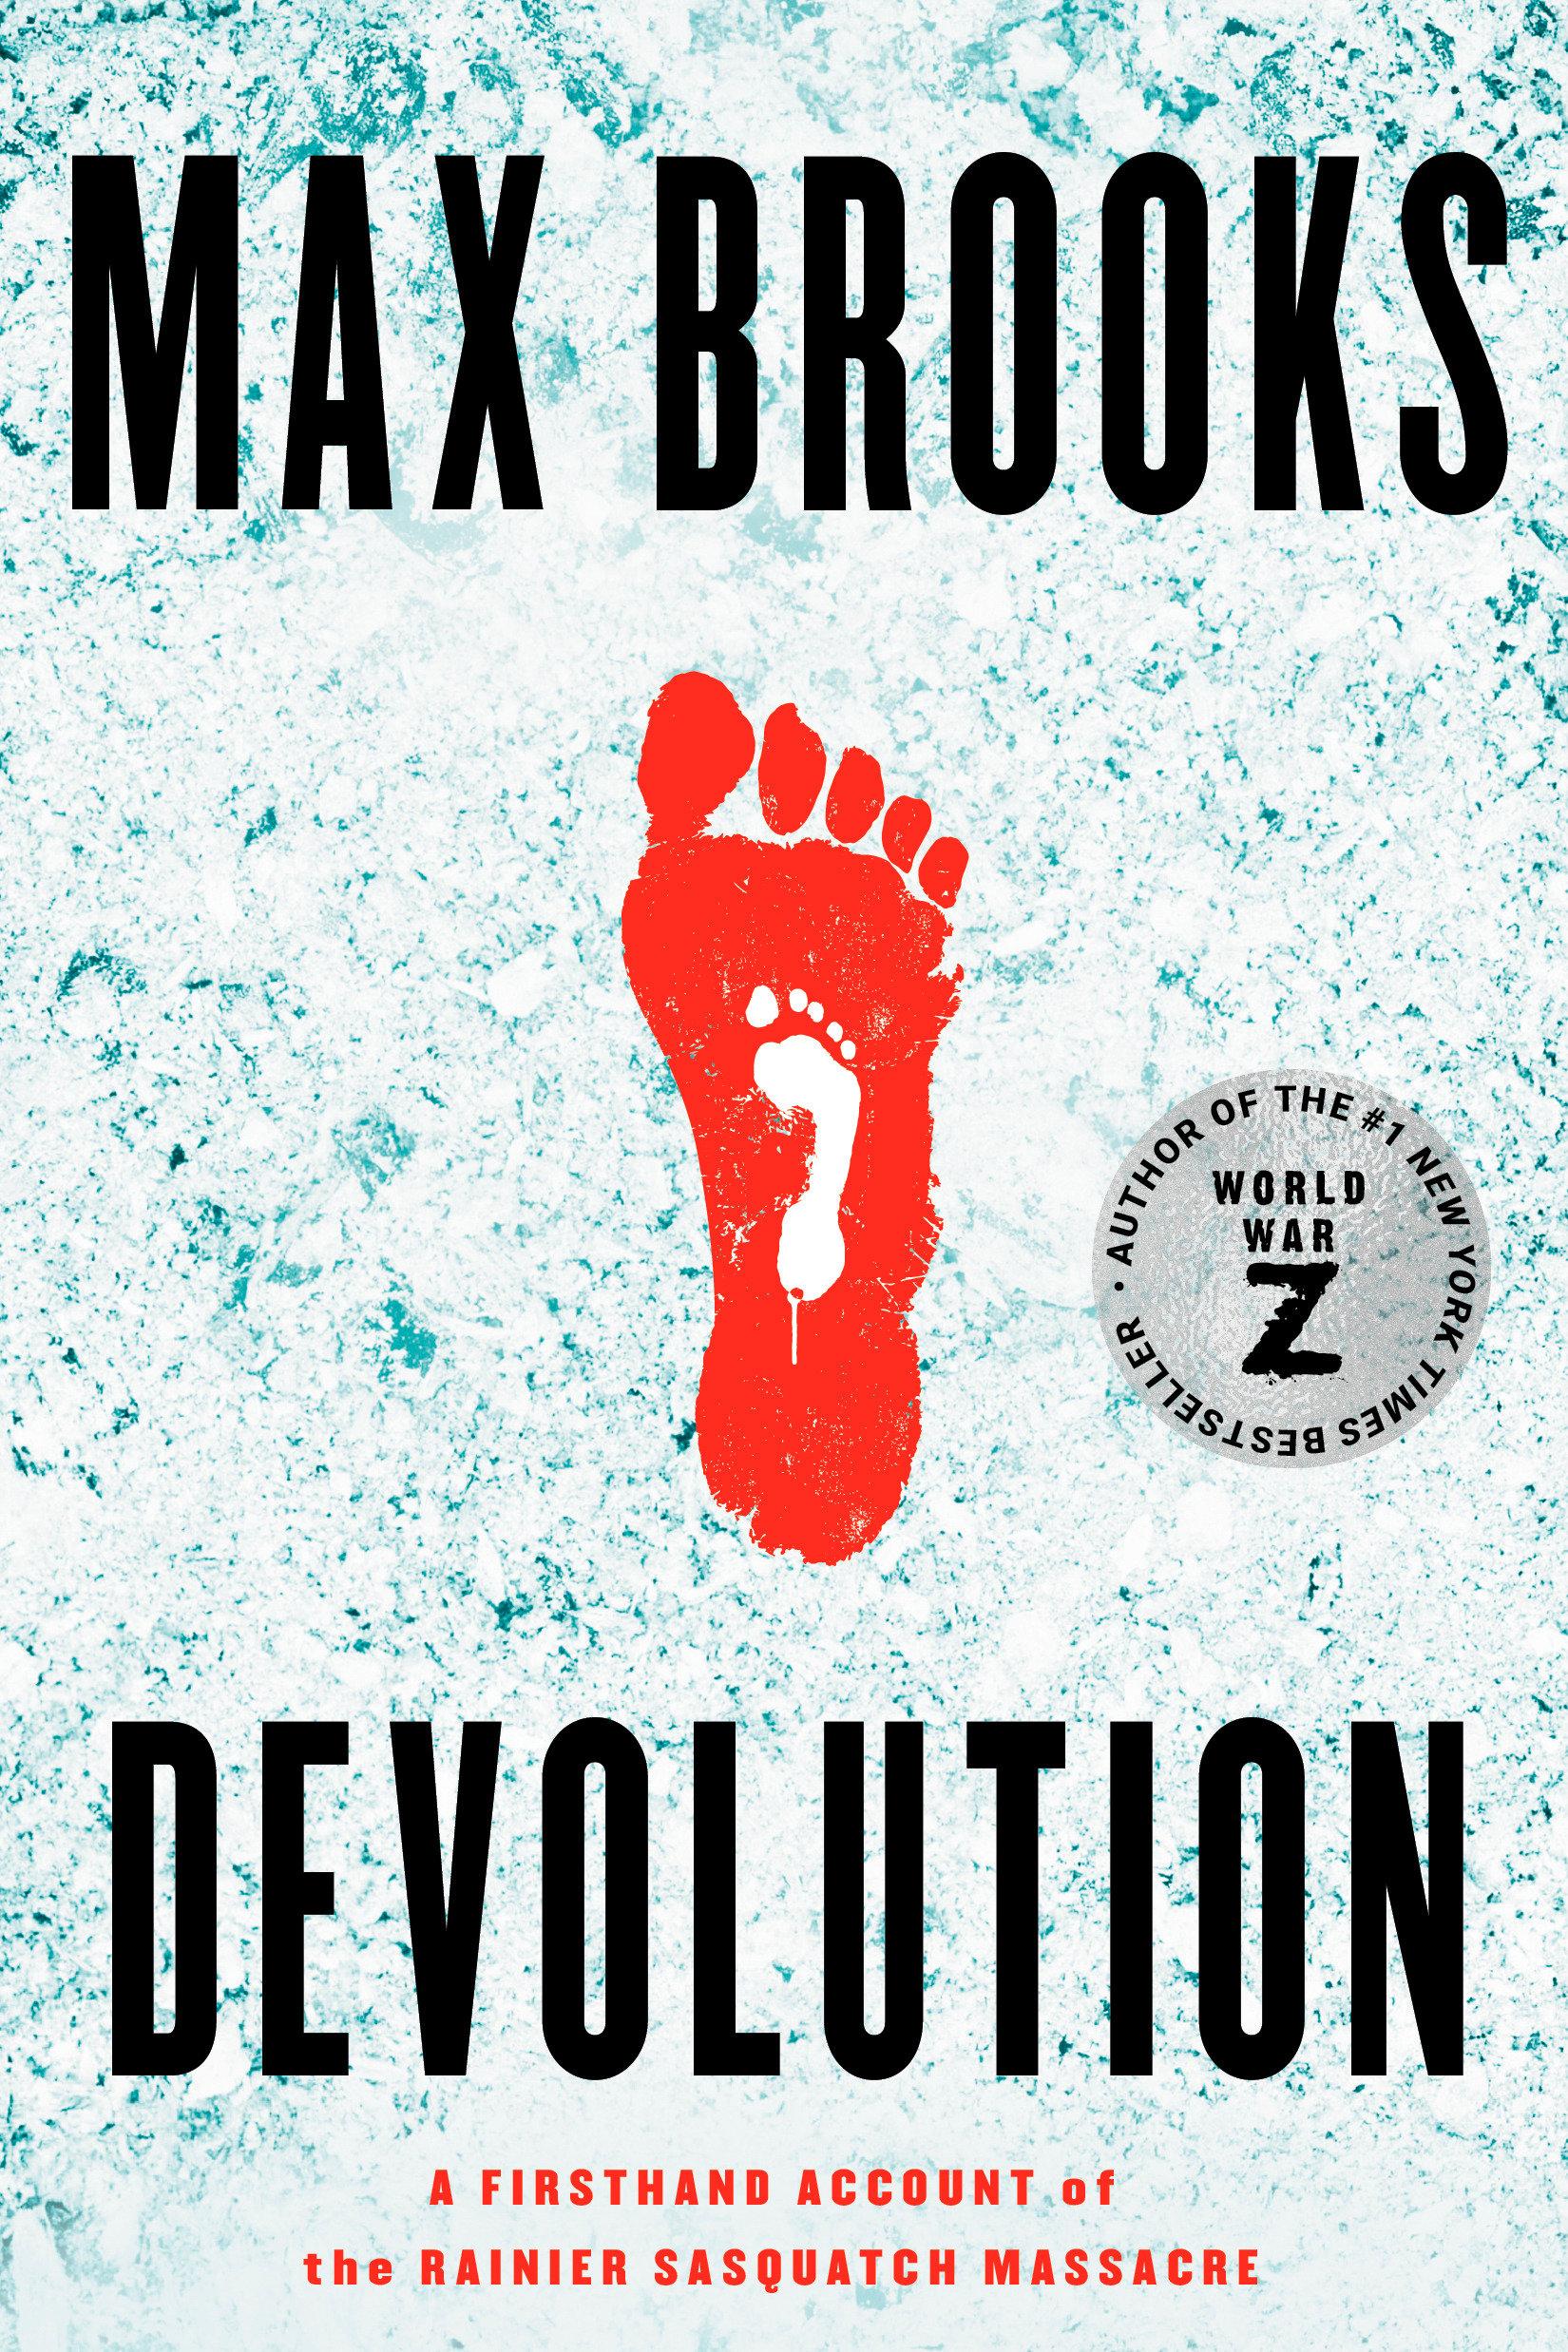 Devolution A Firsthand Account of the Rainier Sasquatch Massacre